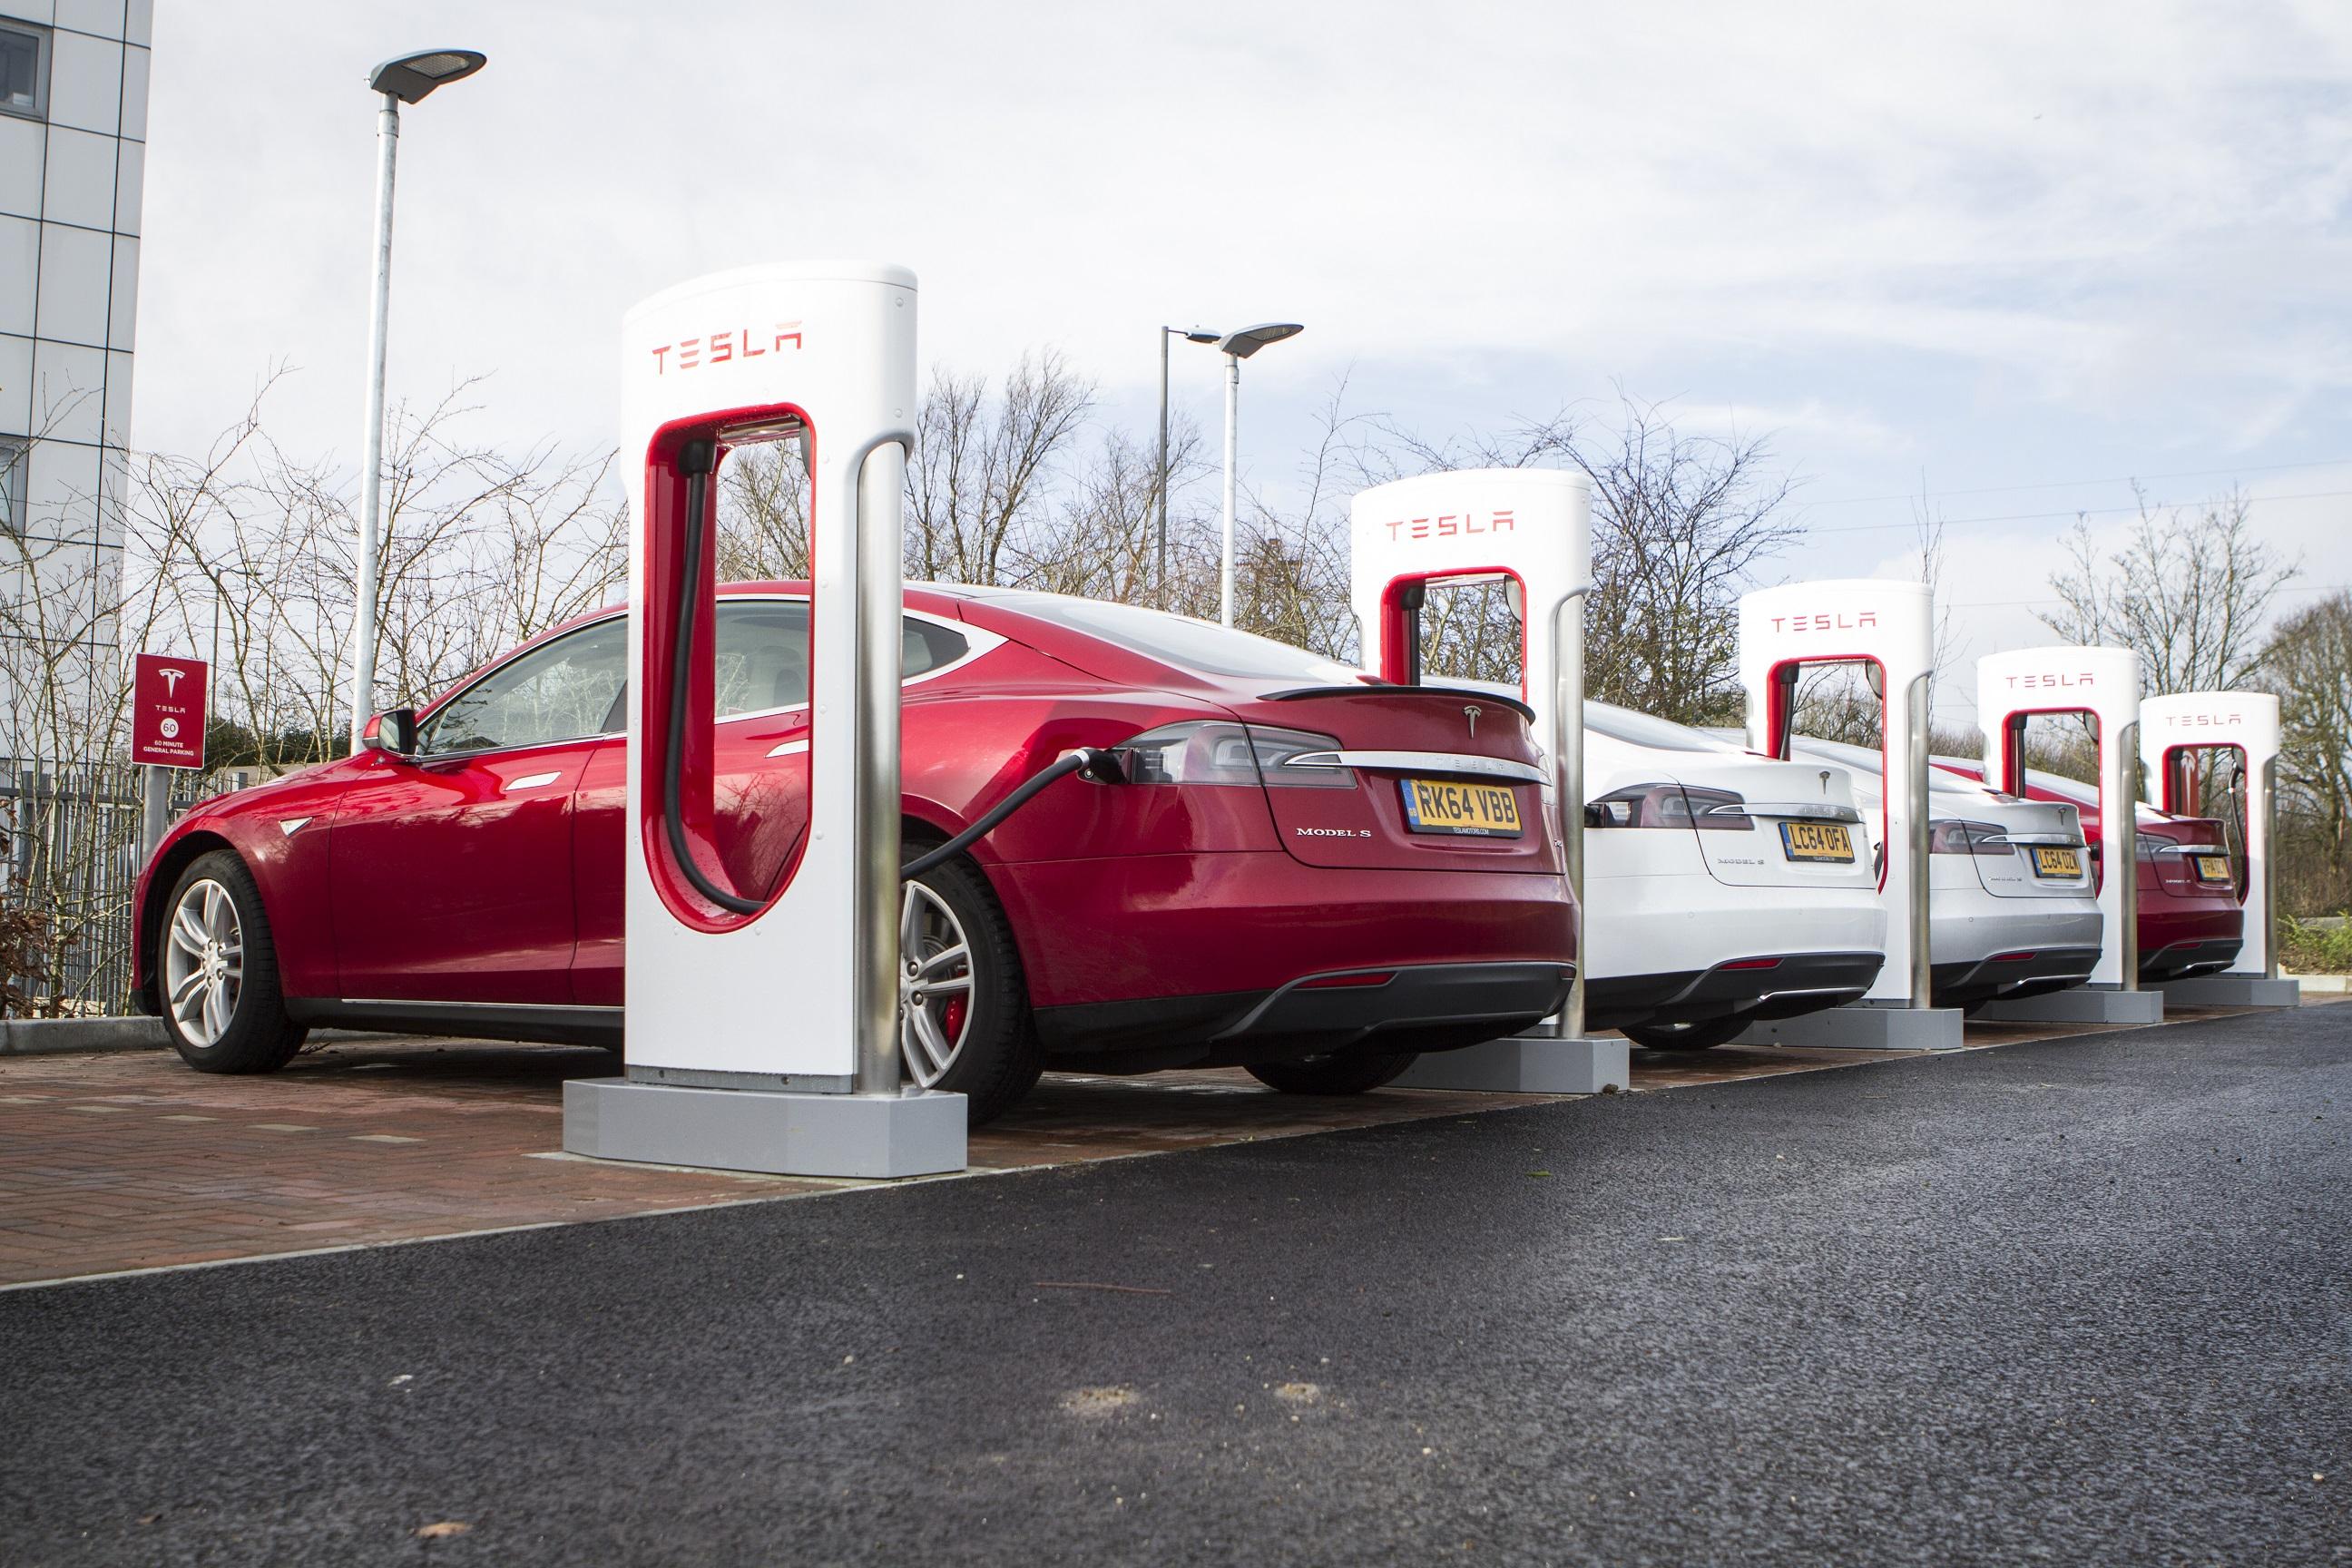 Tesla Model S x3 all charging